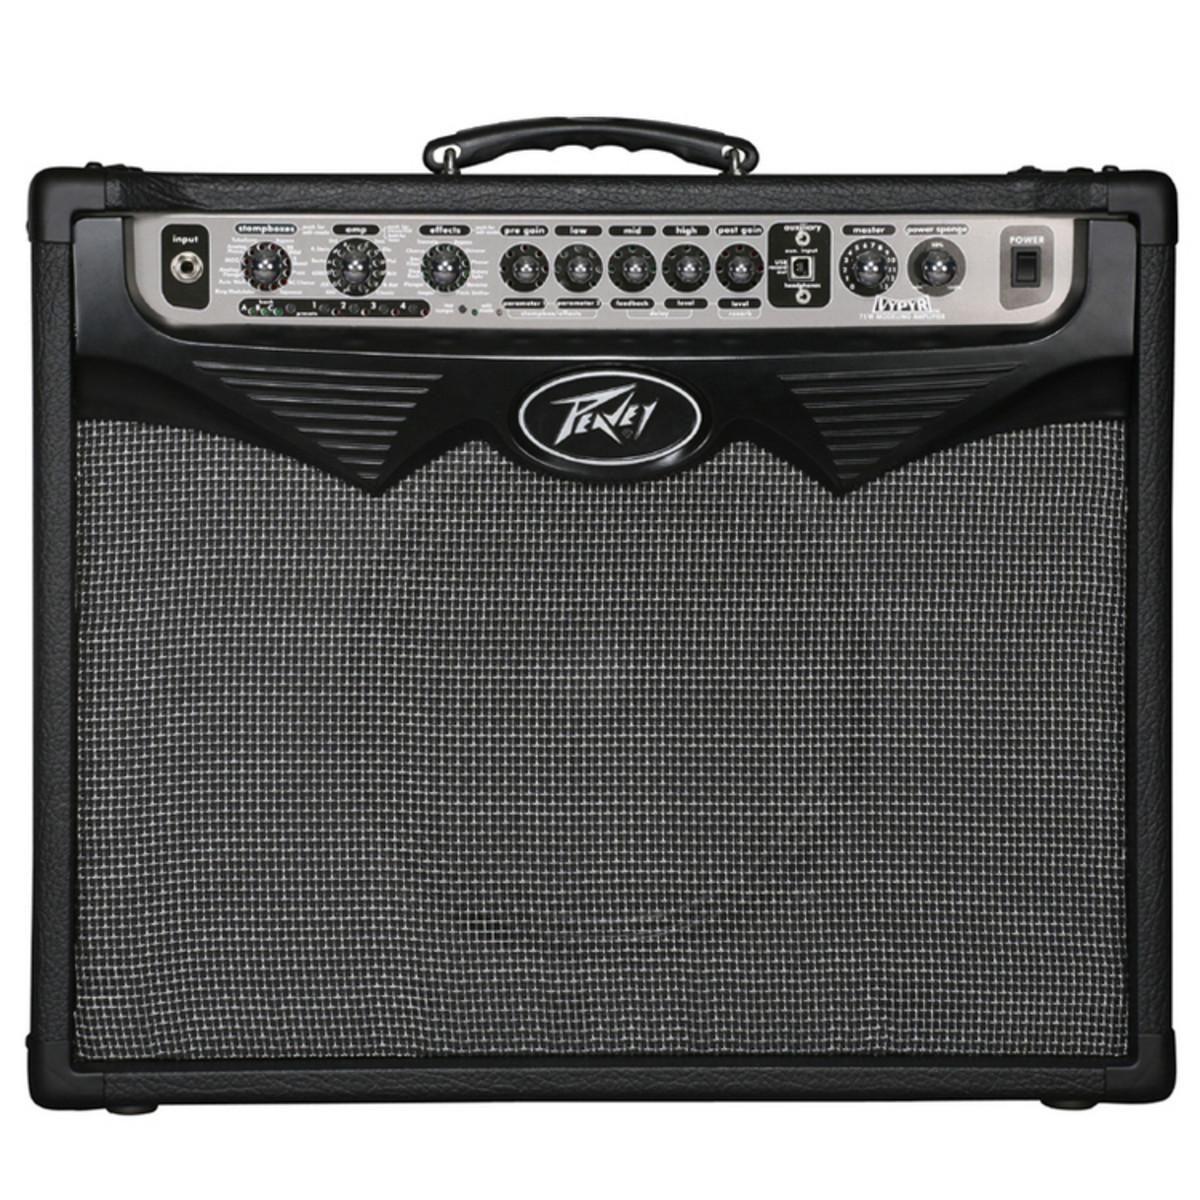 Peavey Vypyr 75 : peavey vypyr 75 guitar amp 75 watts nearly new at ~ Russianpoet.info Haus und Dekorationen